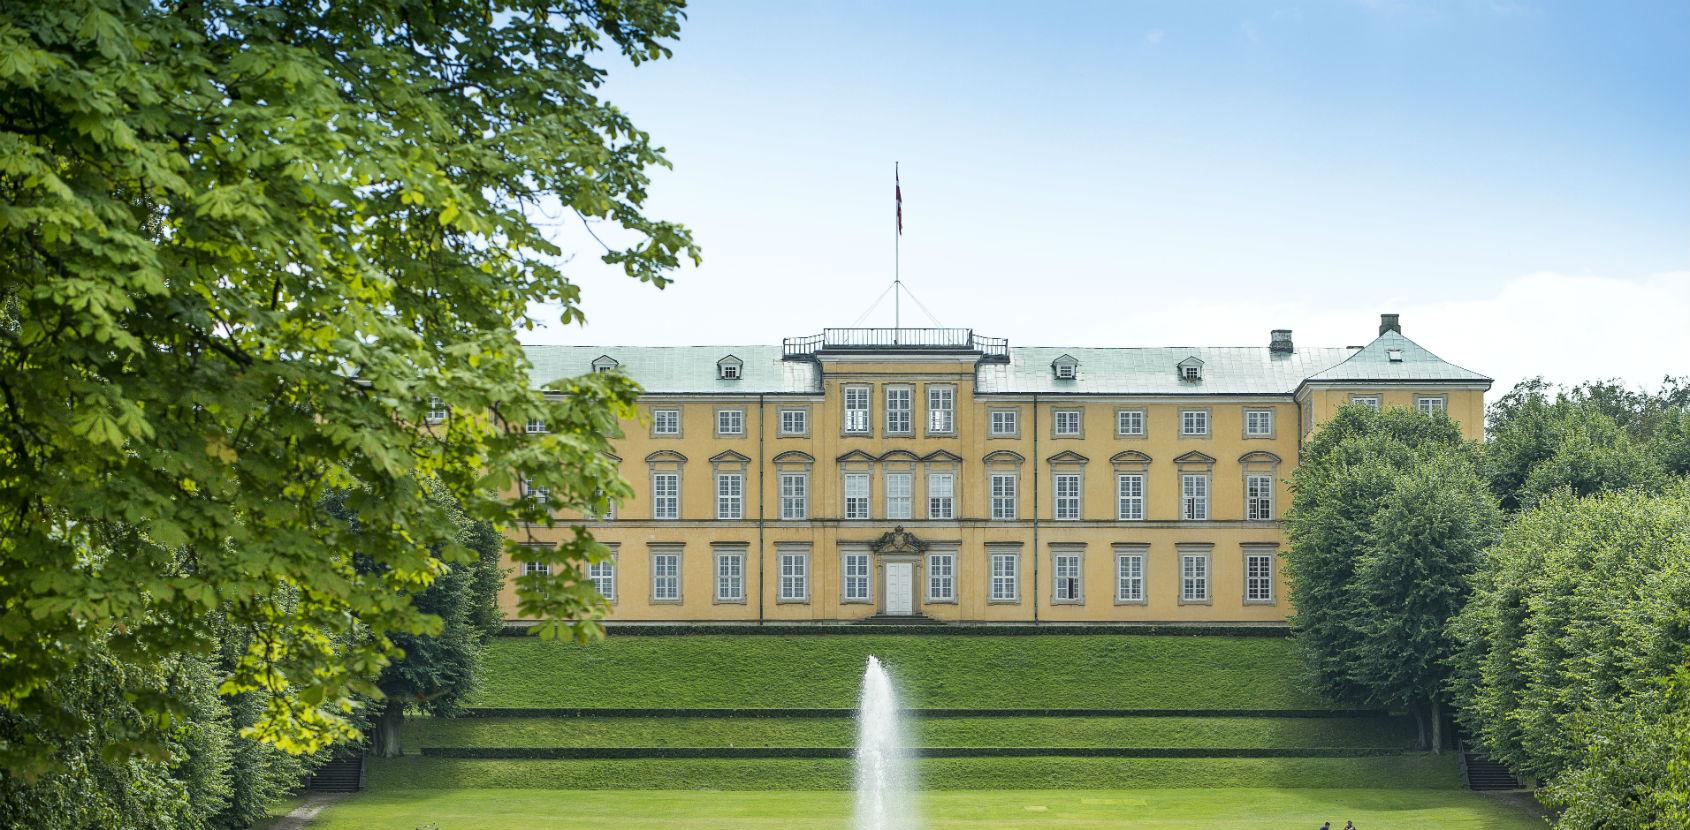 Dansk sex porno Kronborg Slot adresse